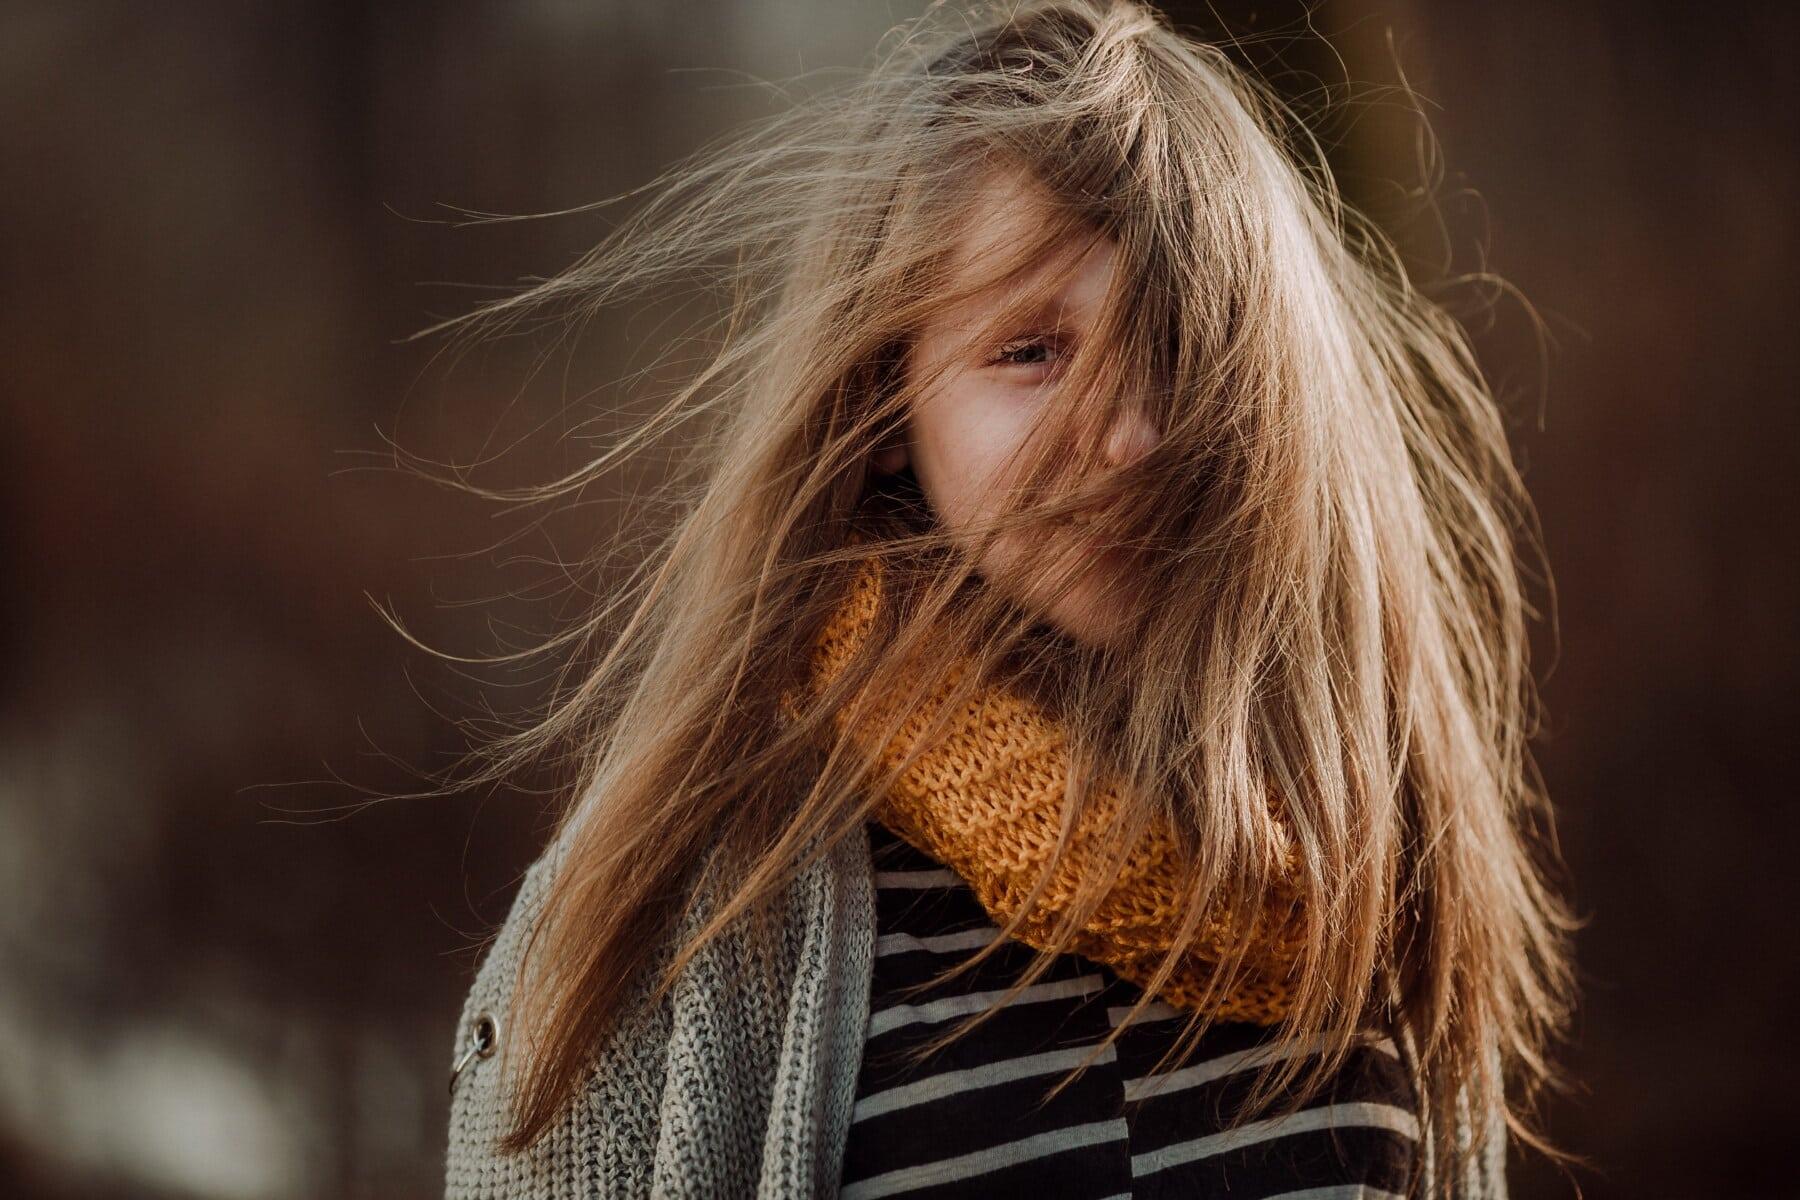 wanita muda, remaja, gadis cantik, gaya rambut, potret, kebahagiaan, masa remaja, kepolosan, Angin, rambut